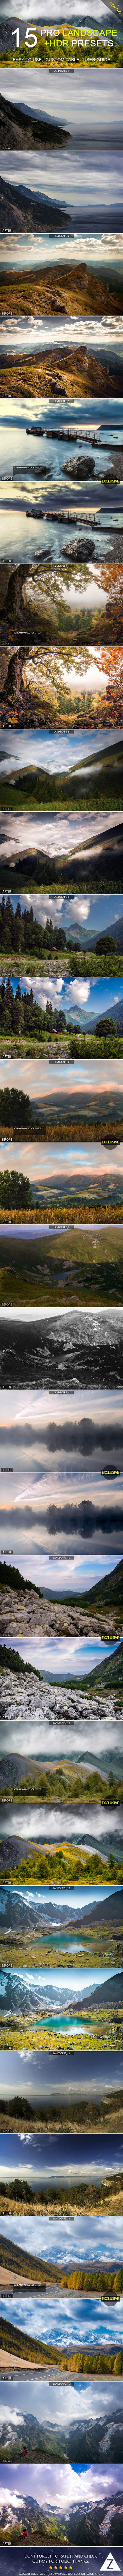 GraphicRiver 15 Pro Landscape&HDR Presets 9695927